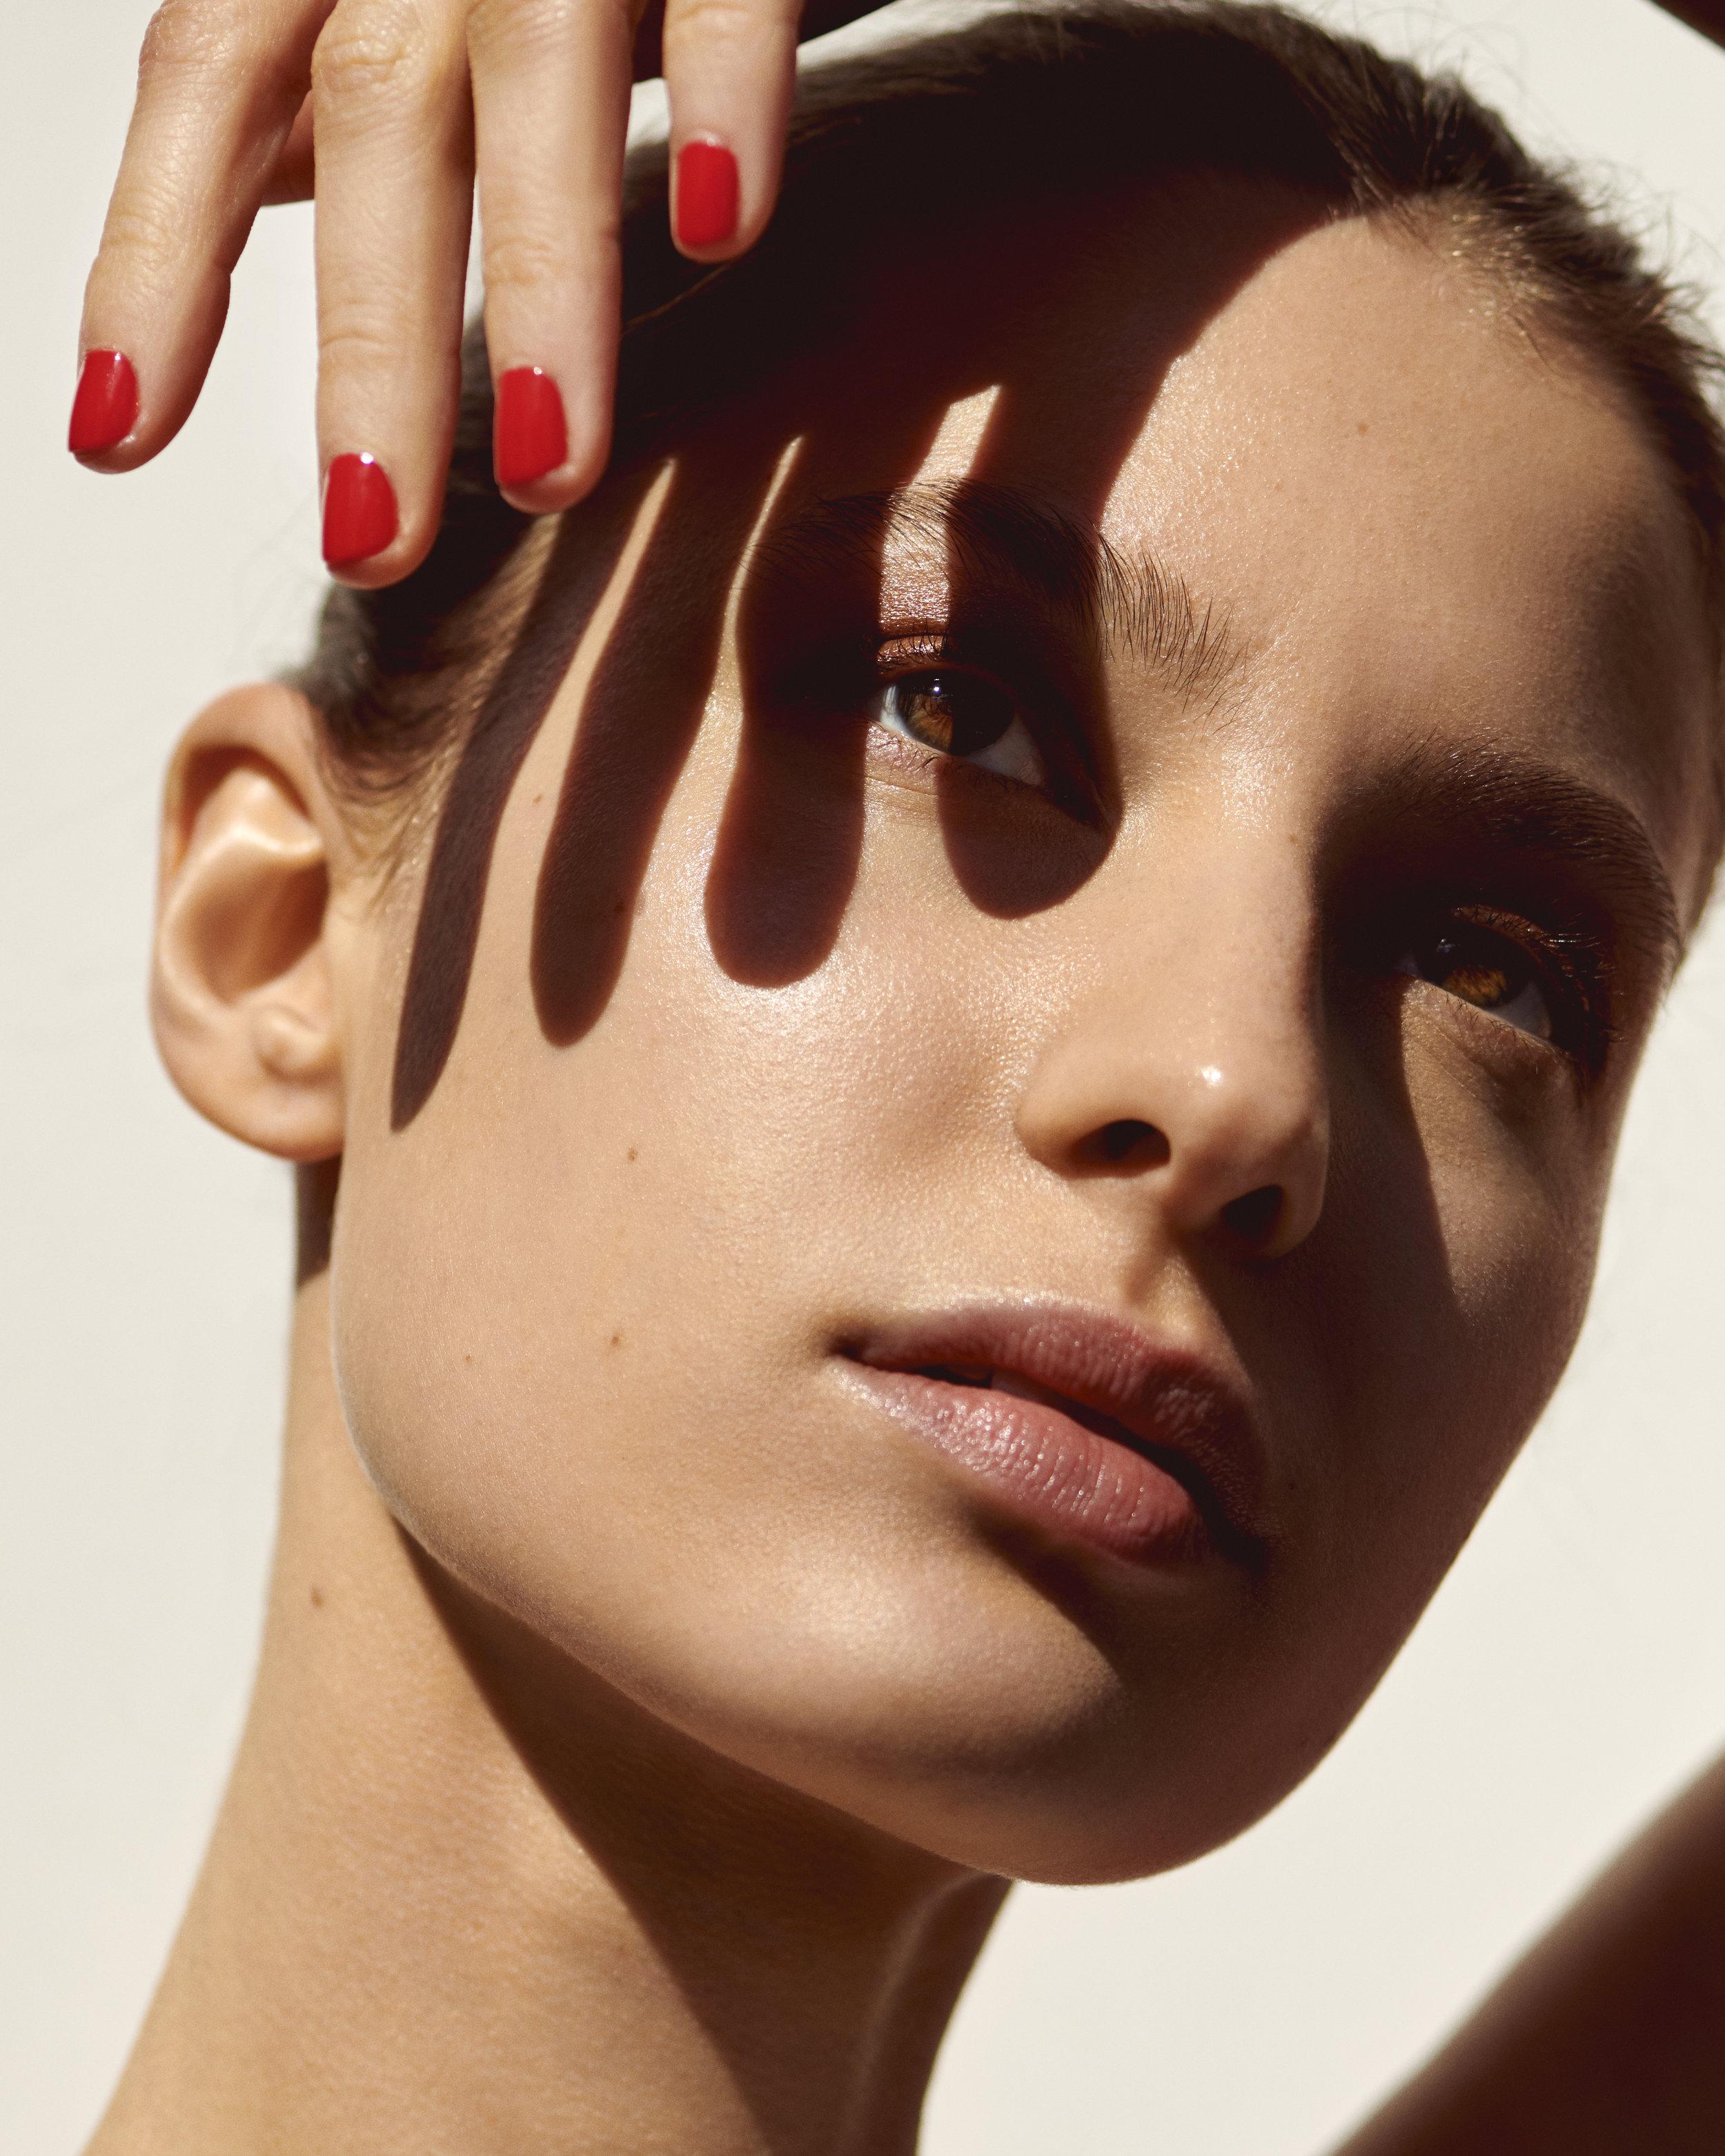 Unconditional-Magazine-Marlene-Kohrs-Summer-2019-2.jpg